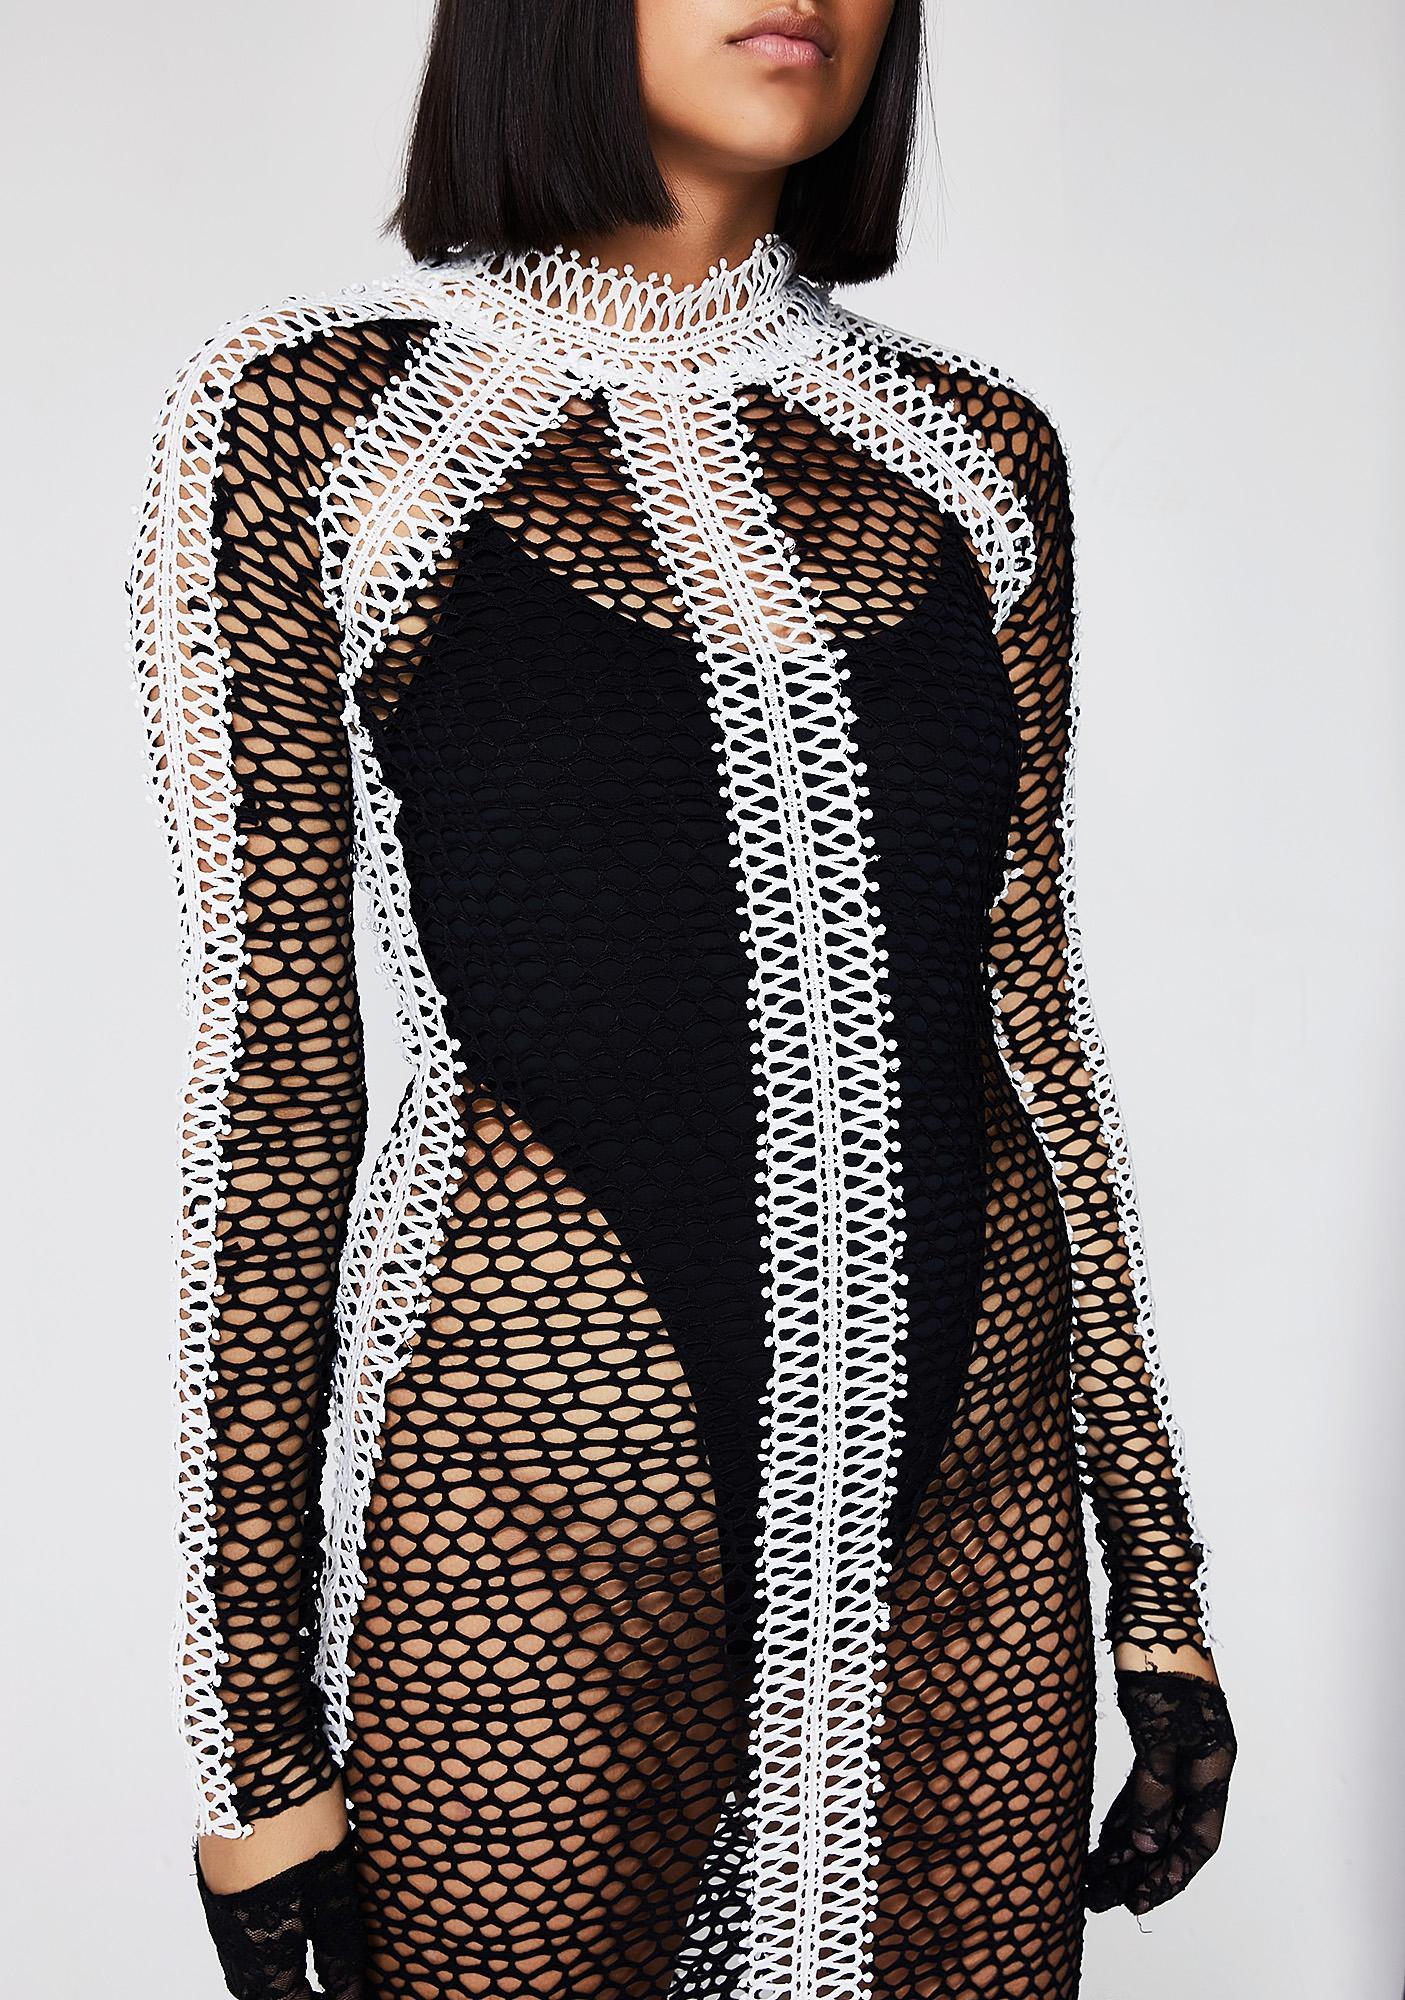 Kiki Riki Tell Me What U Want Dress